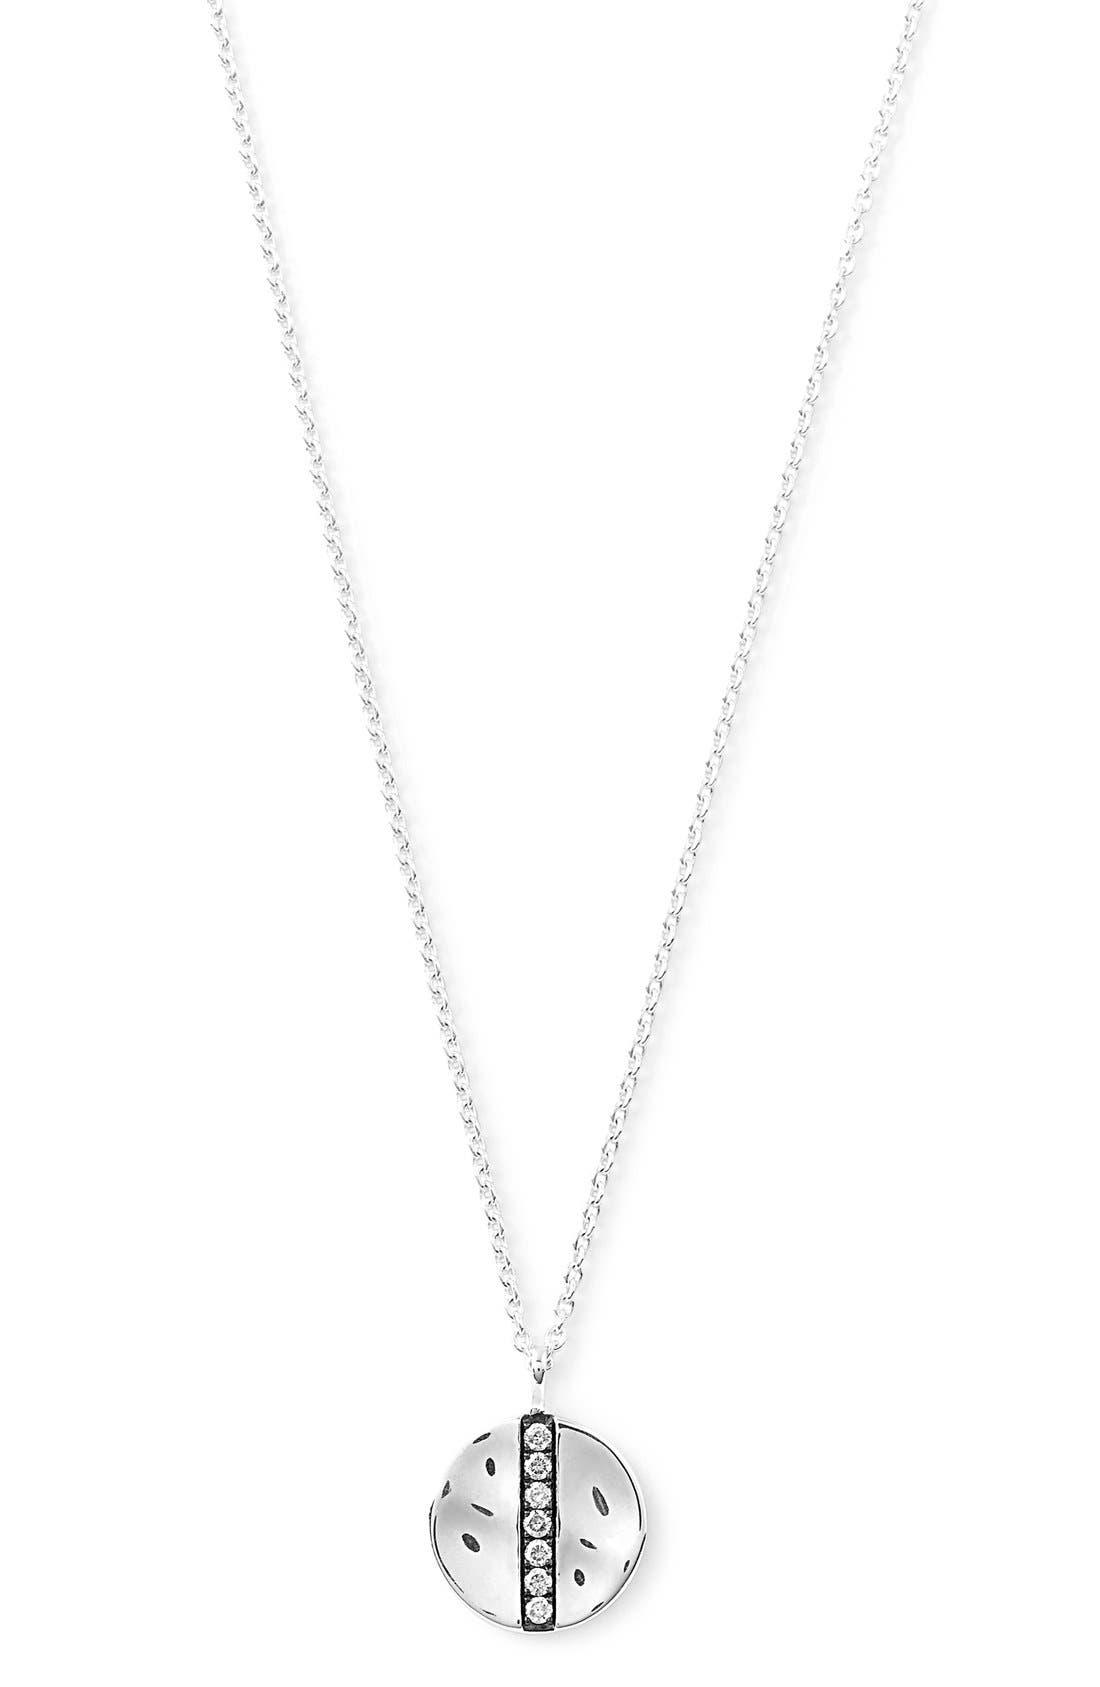 Main Image - Ippolita 'Glamazon - Stardust' Diamond Disc Pendant Necklace